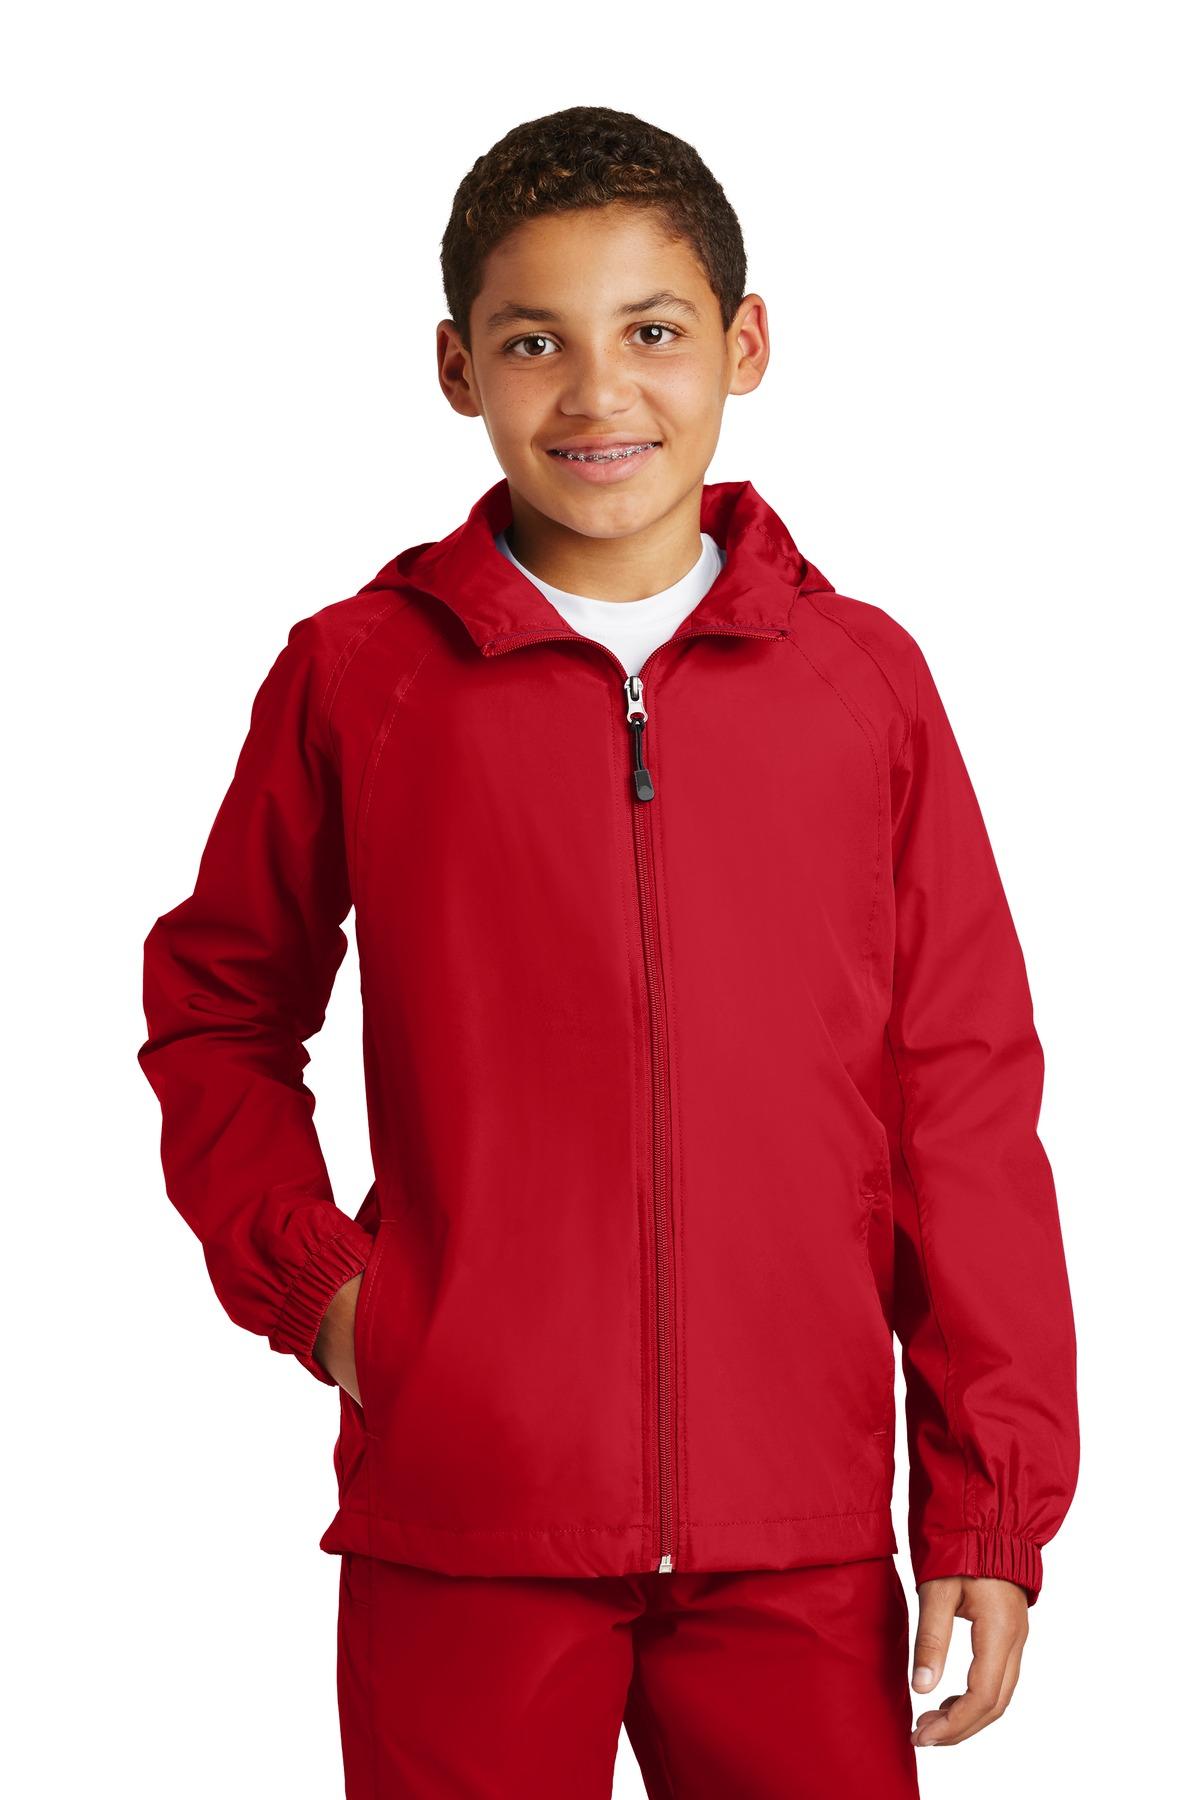 d977f4e05 Sport-Tek ® Youth Hooded Raglan Jacket. YST73